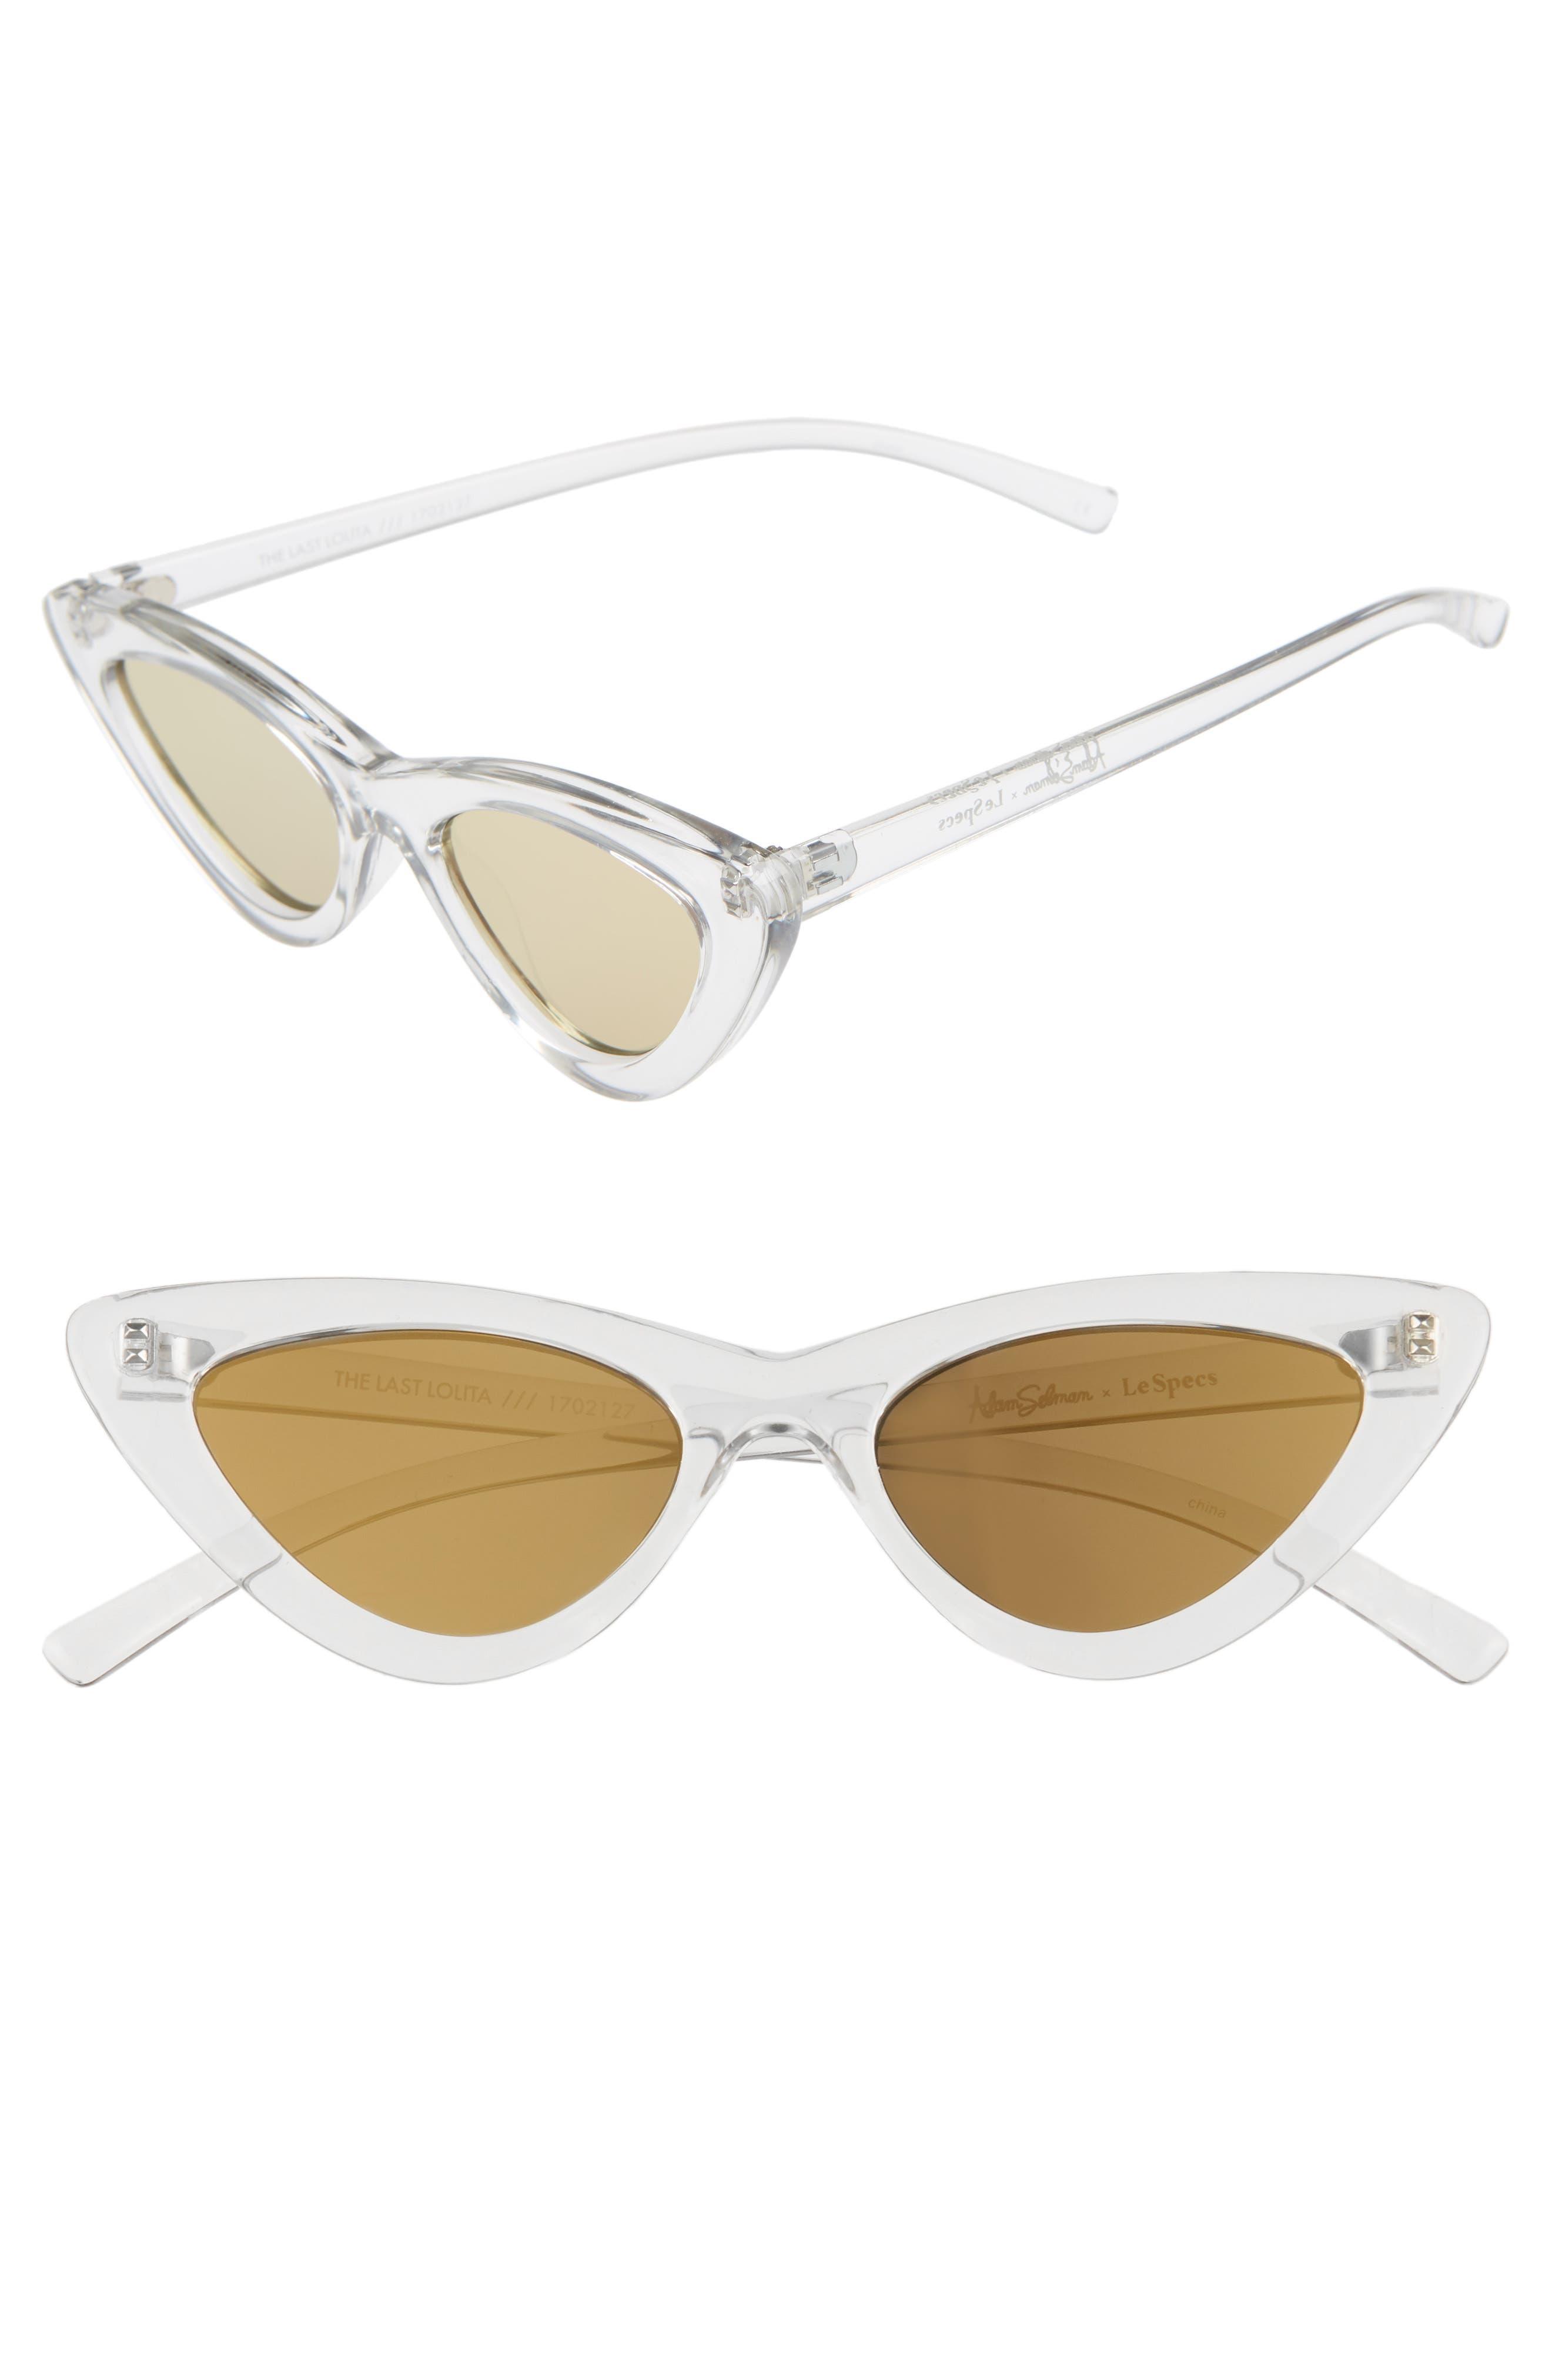 Lolita 49mm Cat Eye Sunglasses,                             Main thumbnail 1, color,                             CRYSTAL GREY